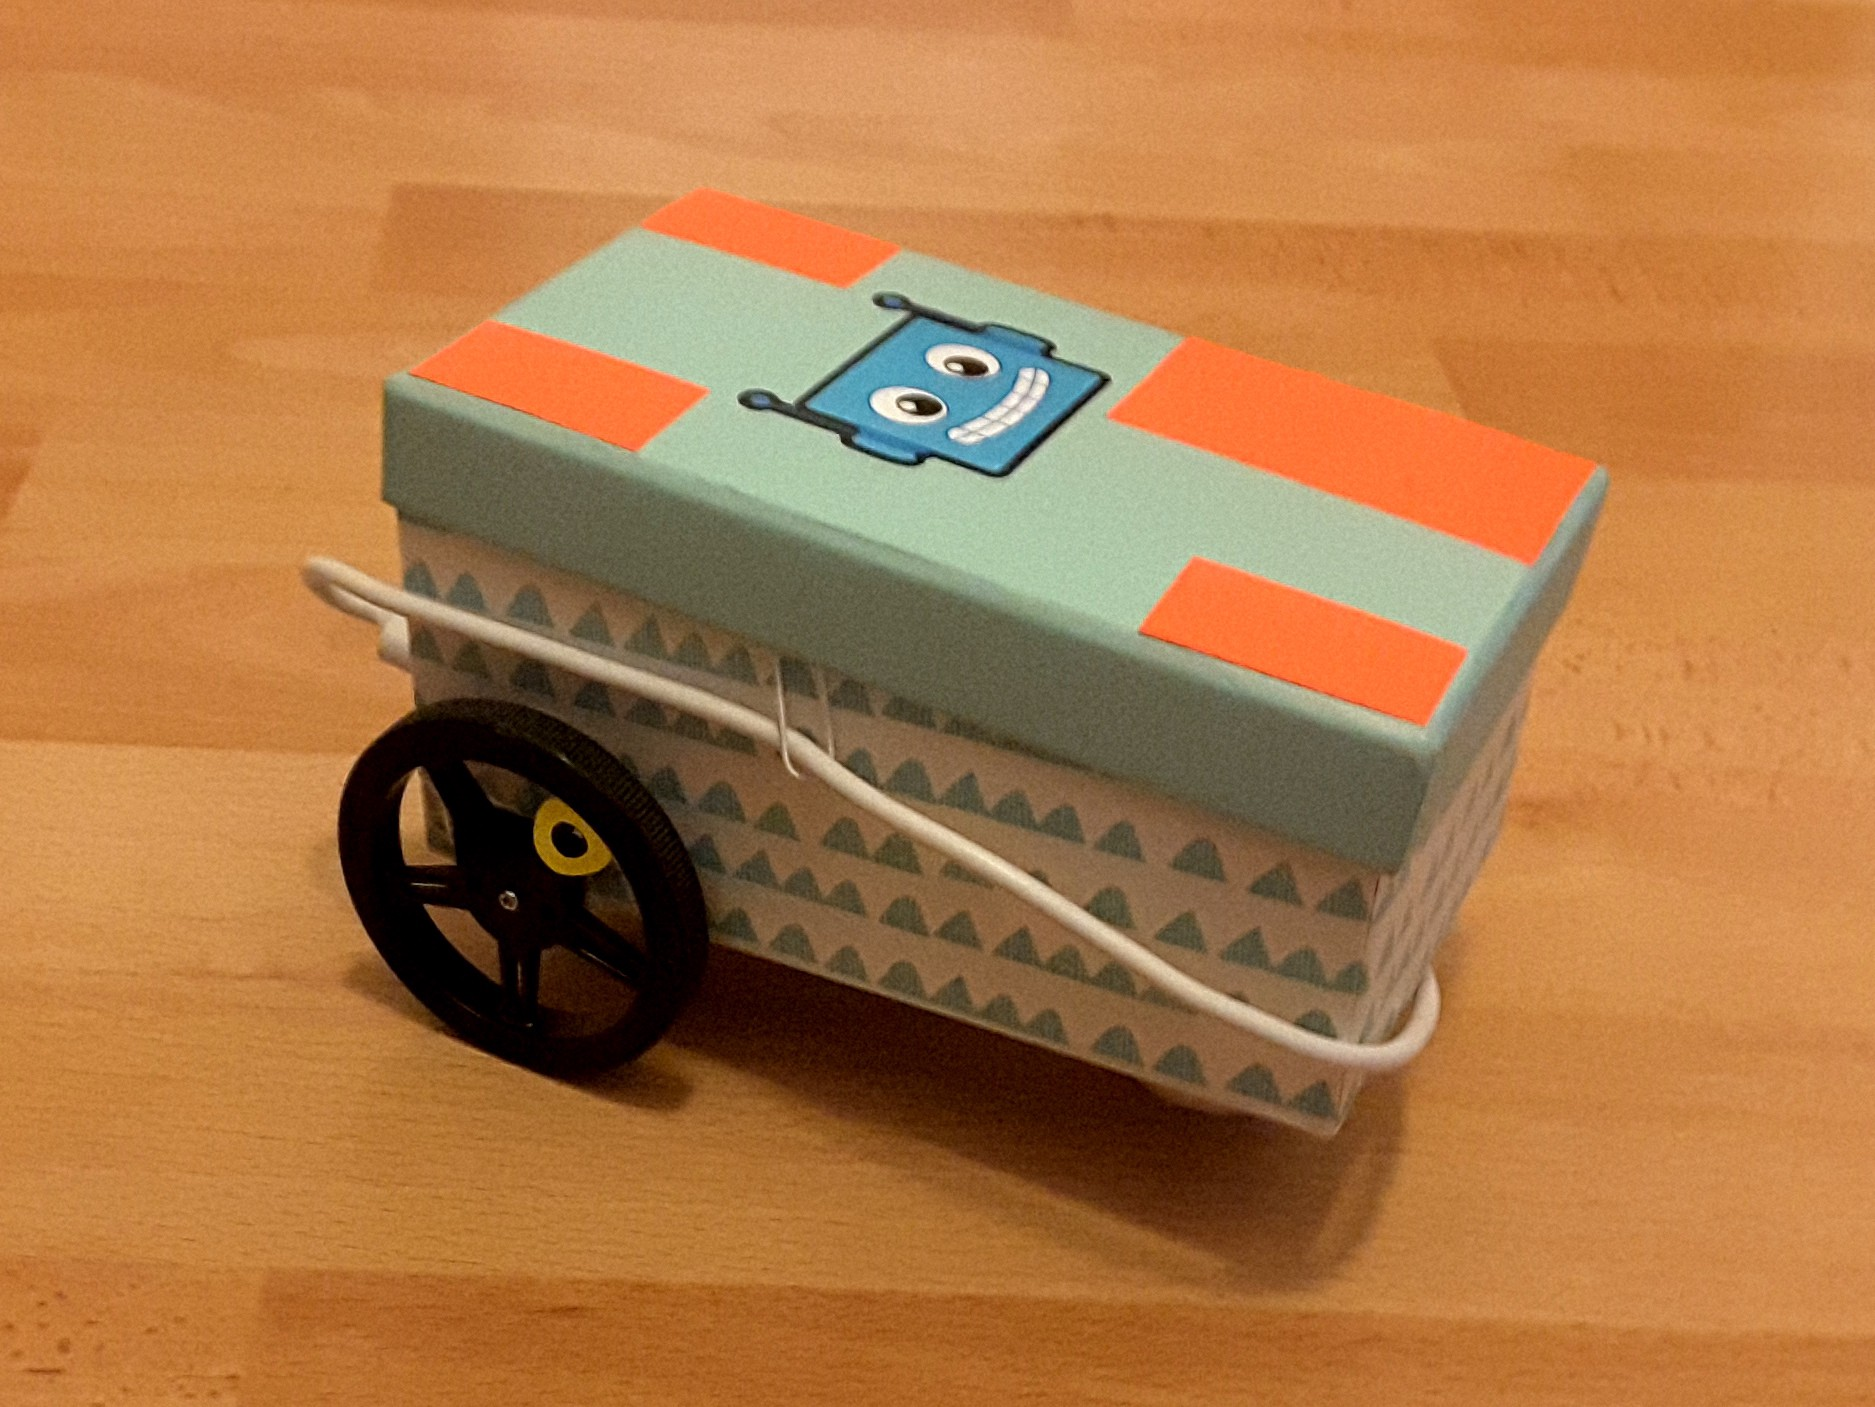 /my-raspberry-pi-on-2-wheels-c7c173918115 feature image